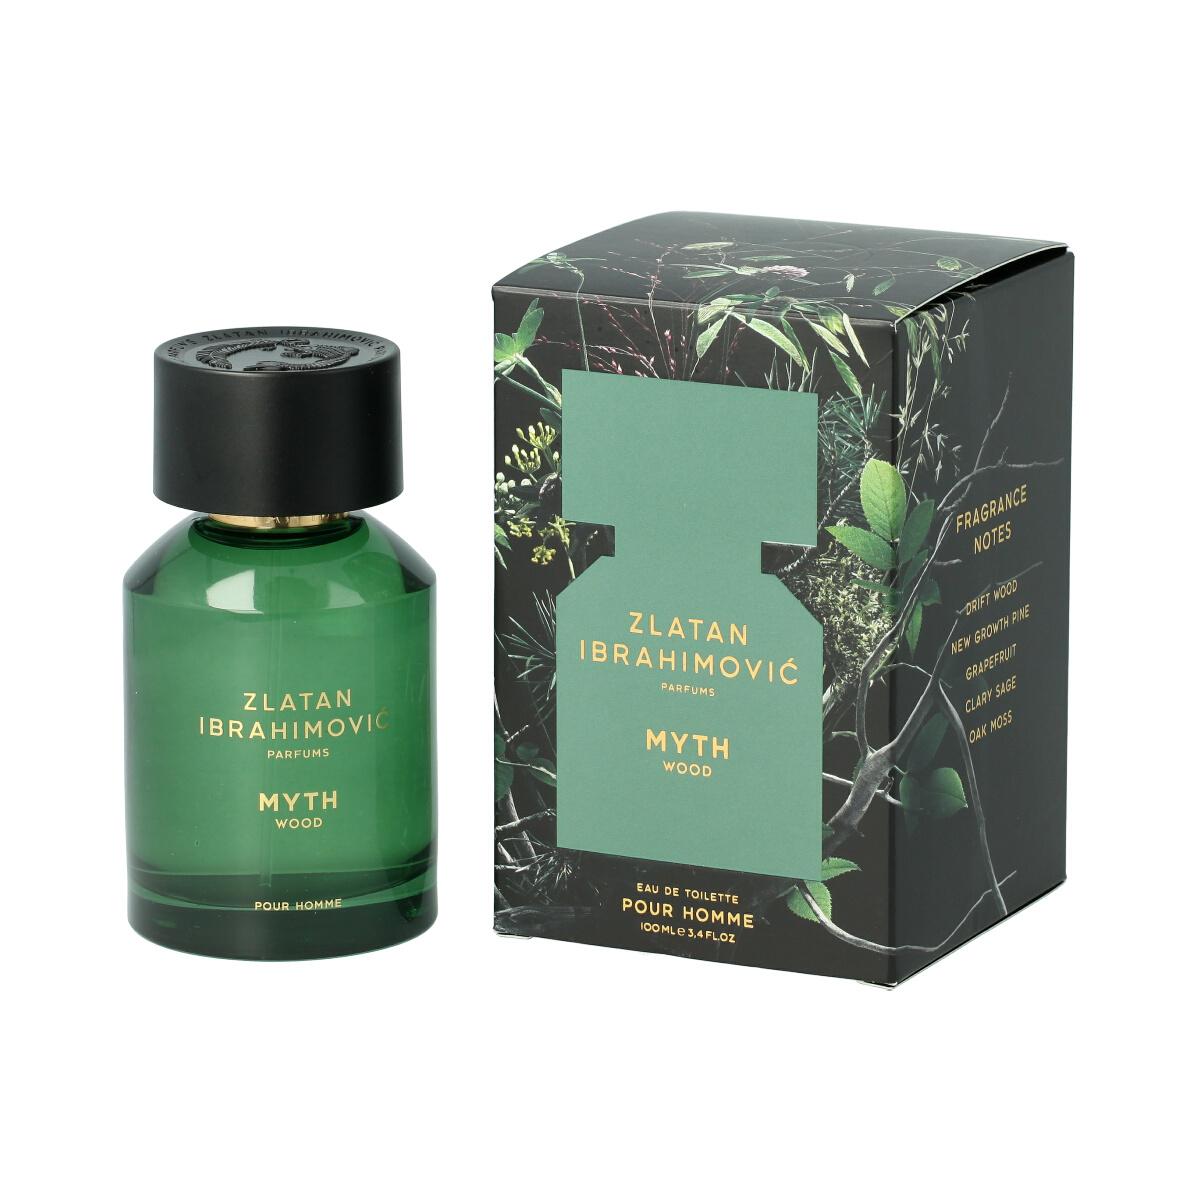 Zlatan Ibrahimovic Parfums Myth Wood Eau De Toilette 100 ml (man) 11884